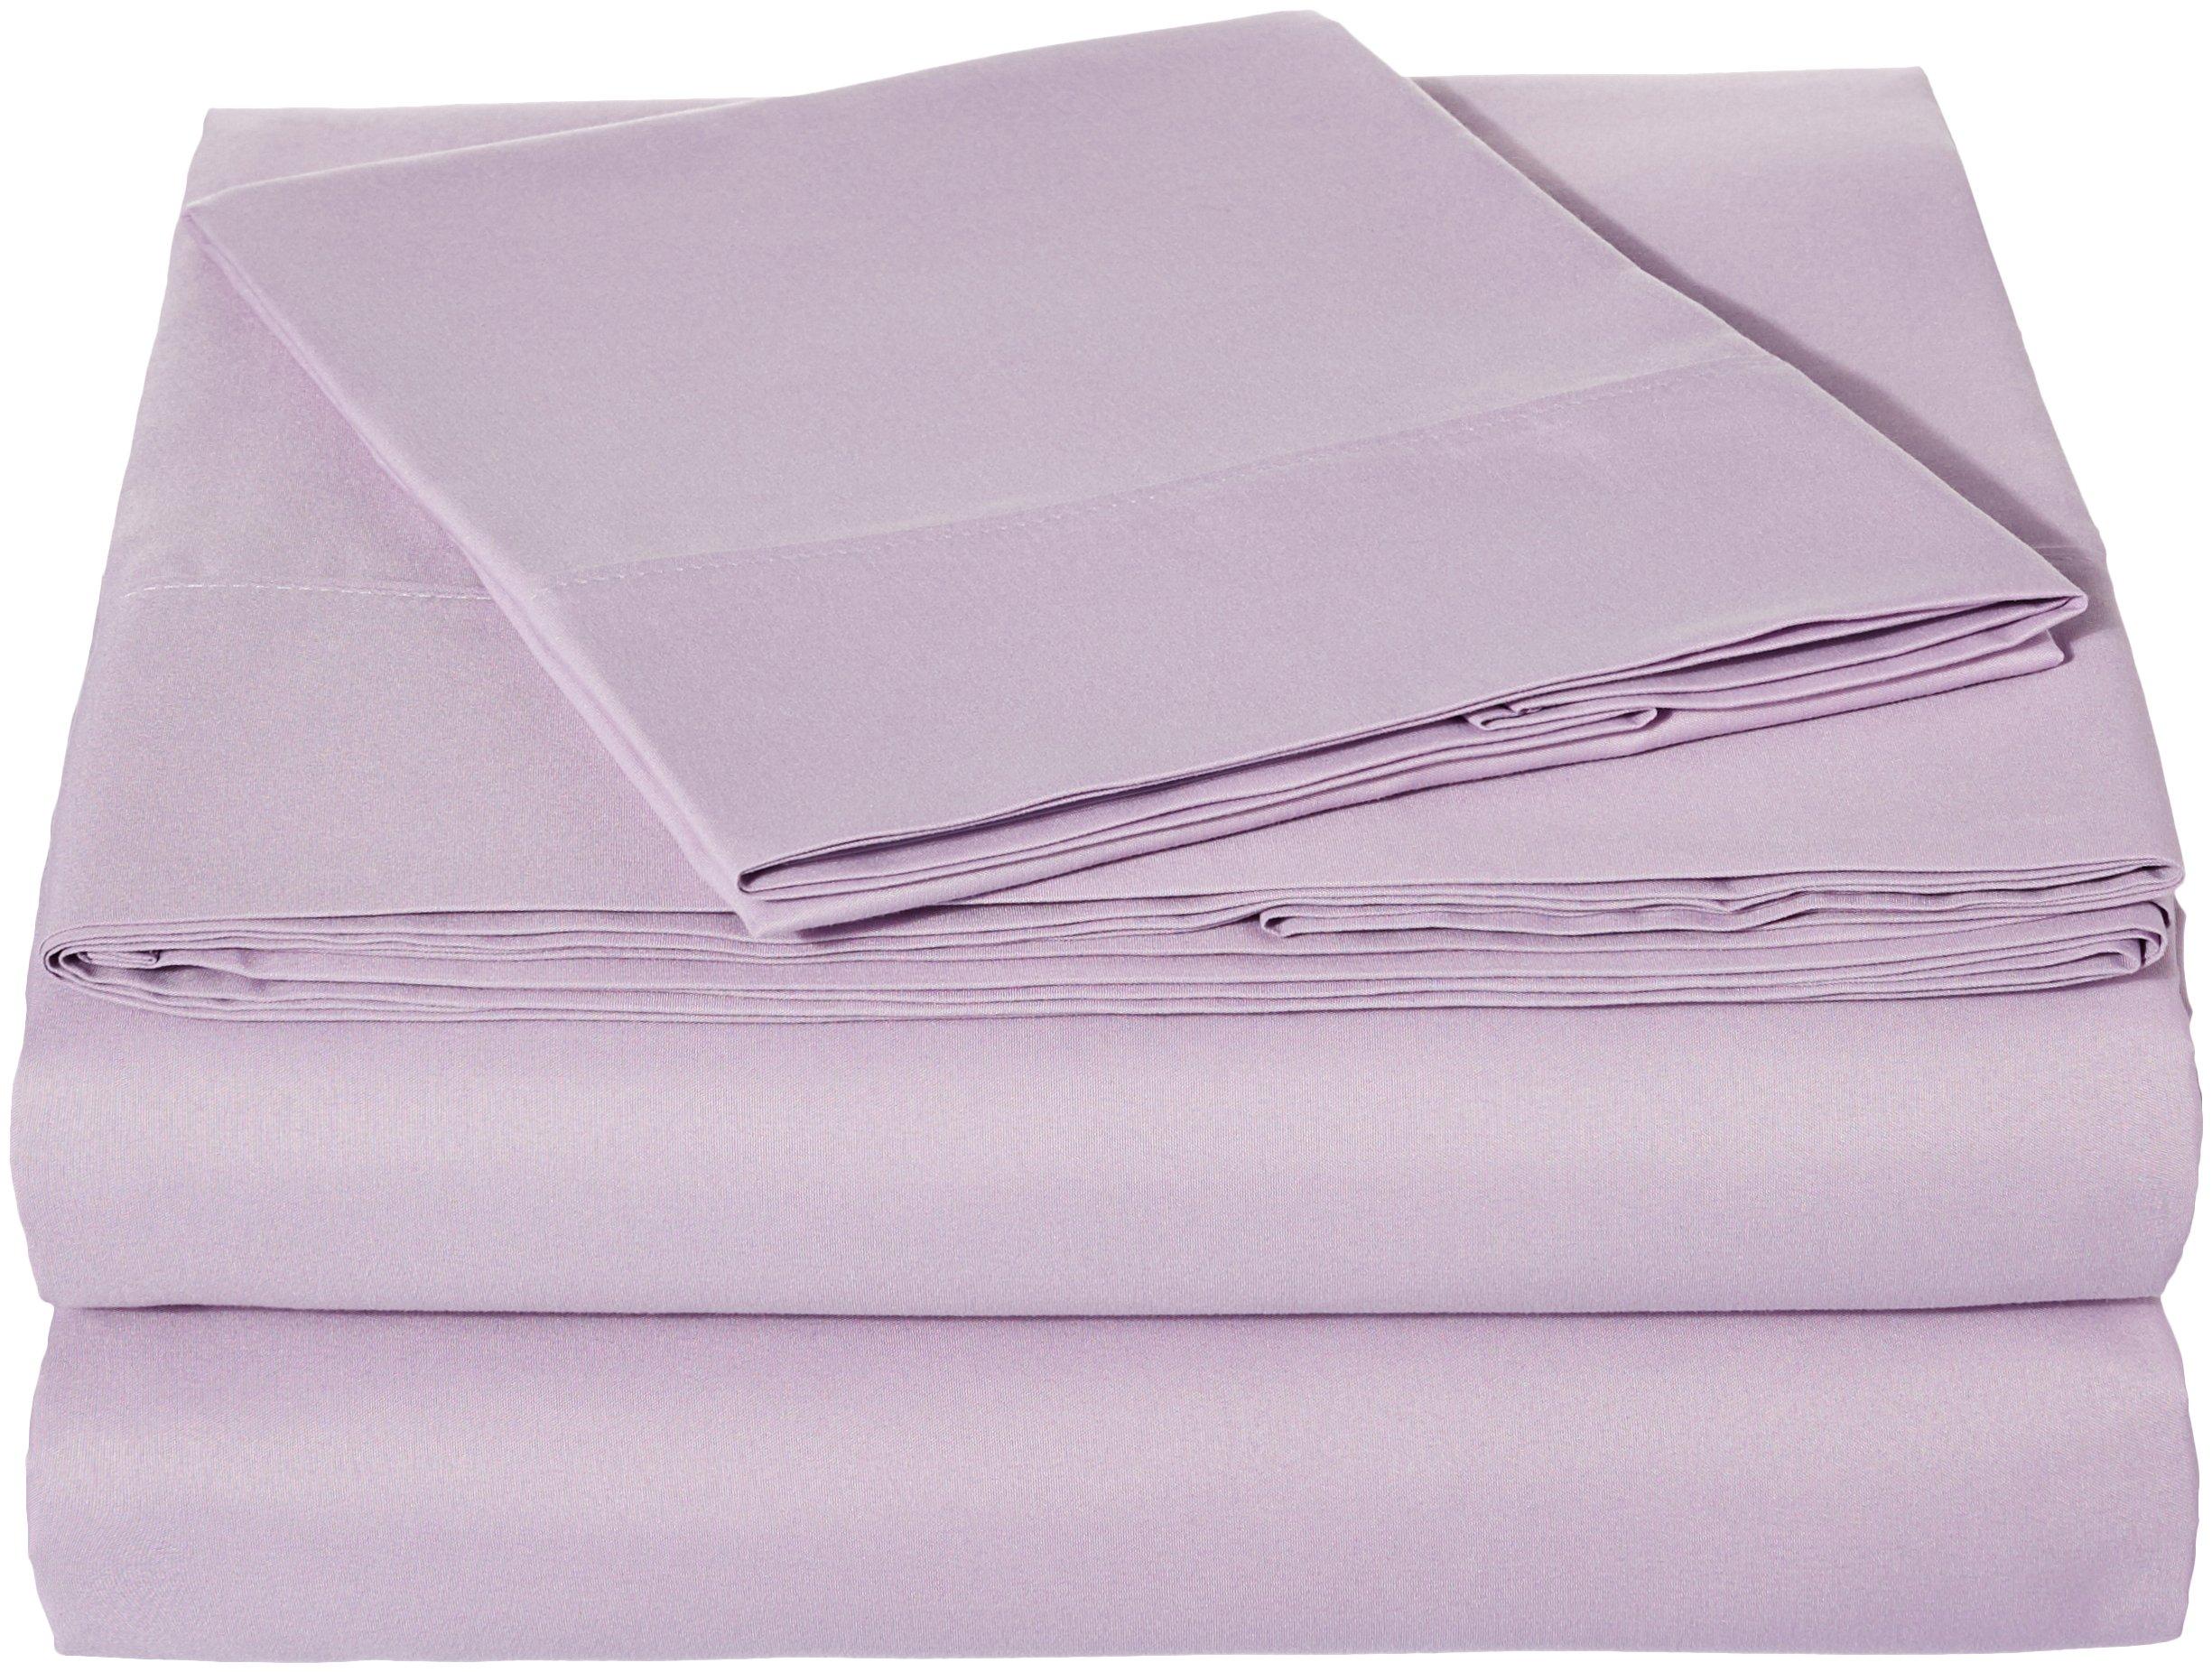 AmazonBasics Microfiber Sheet Set - Twin Extra-Long, Frosted Lavender